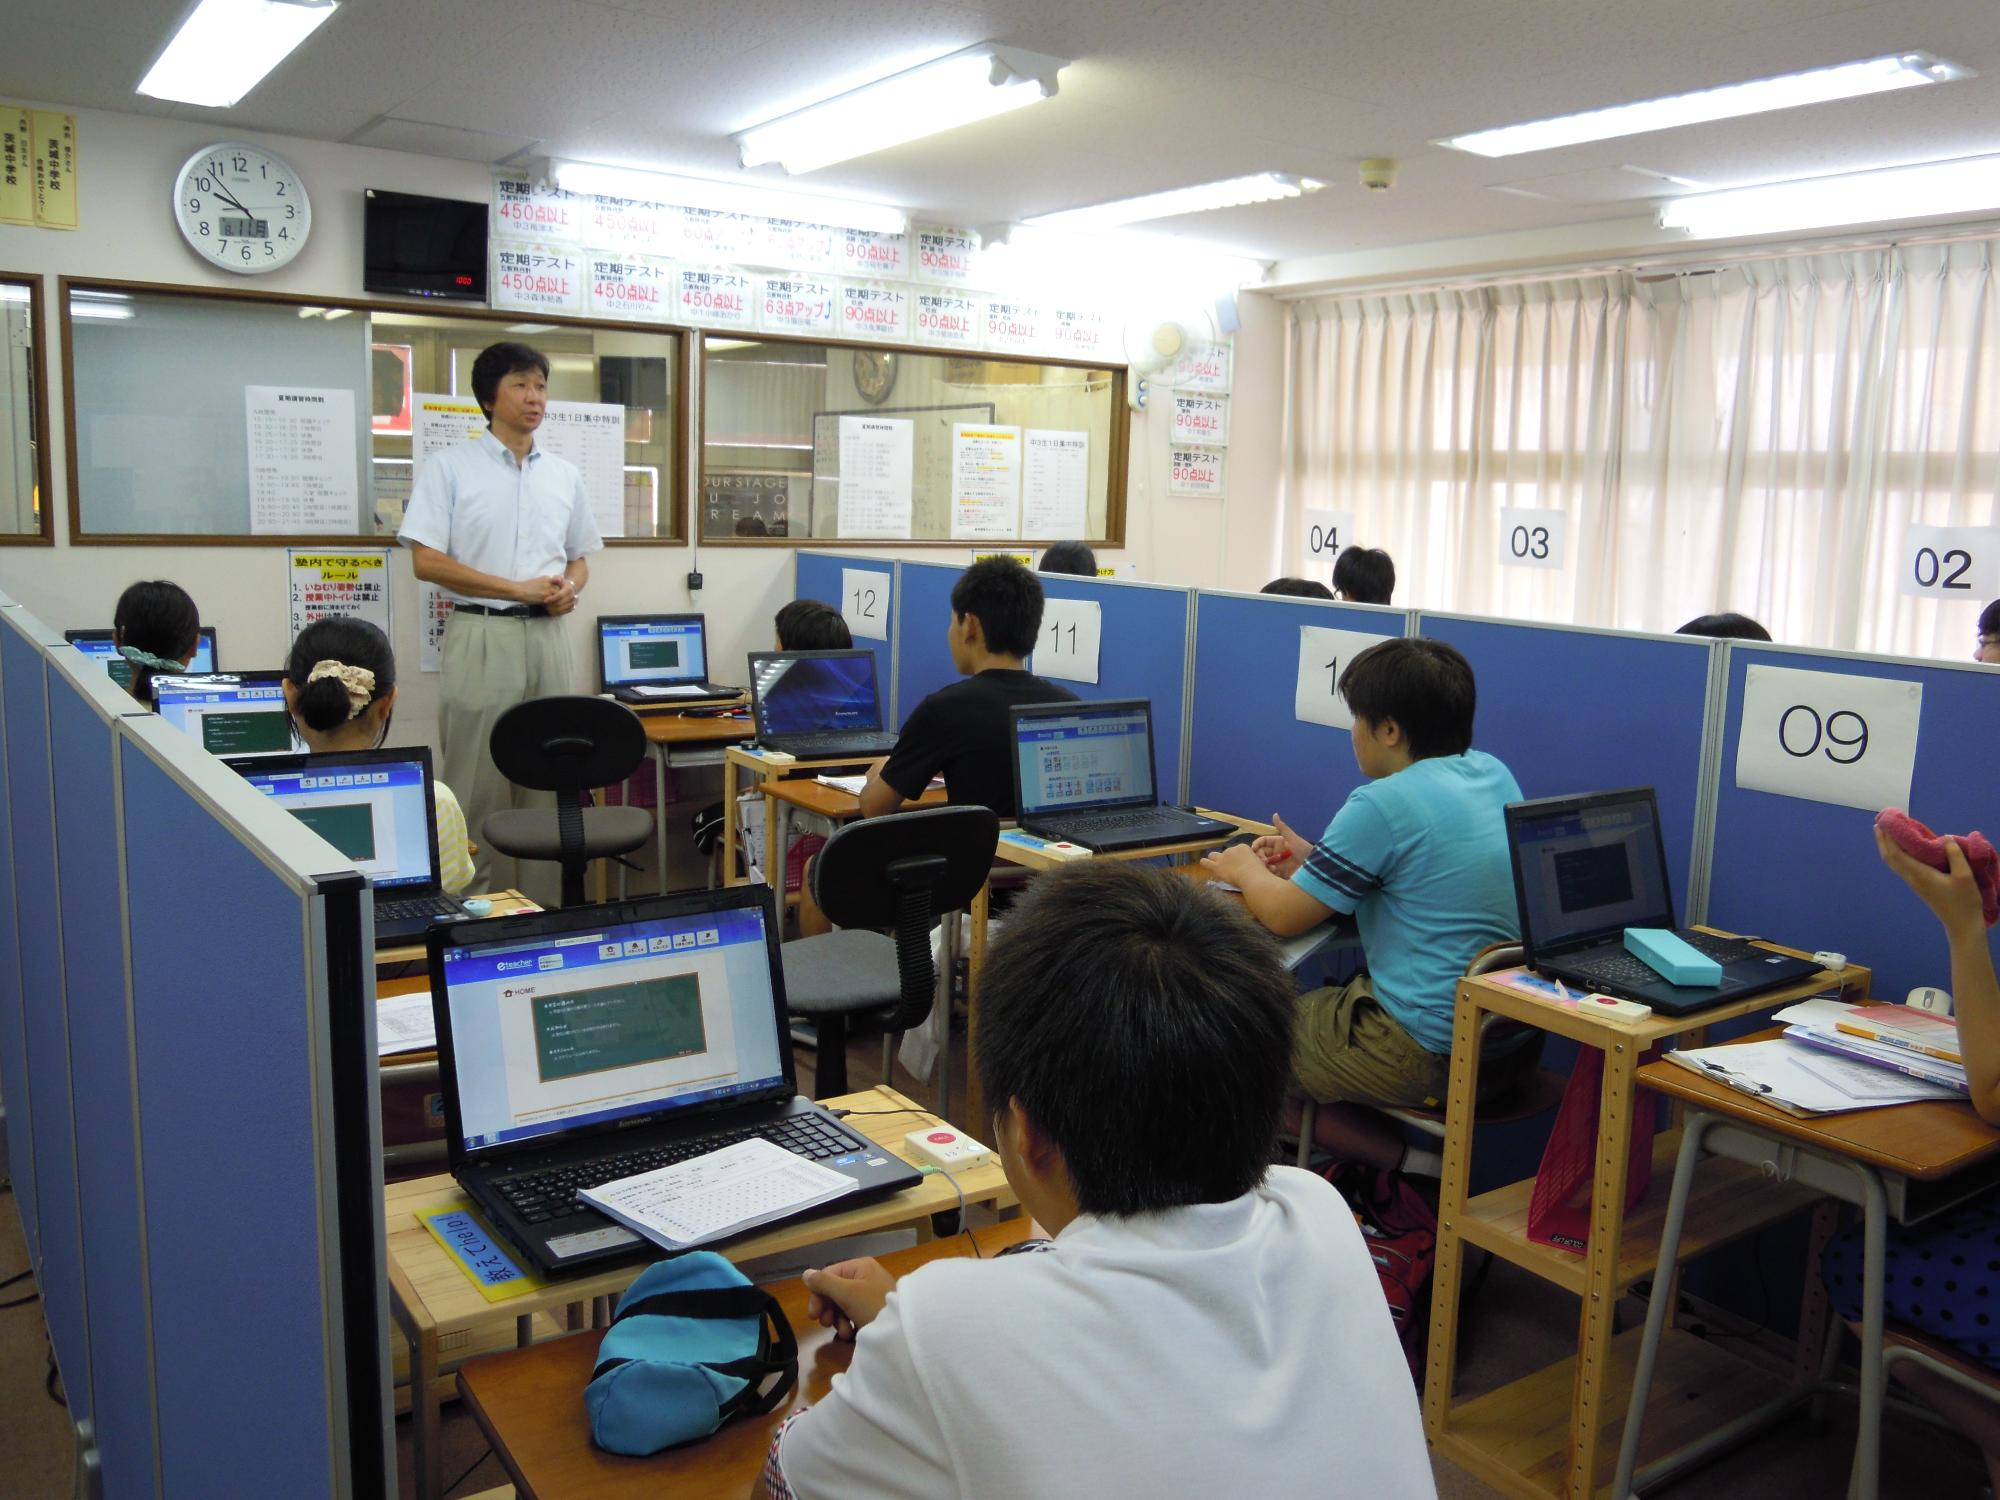 夏期講習一日集中特訓講座を実施しましたpage-visual 夏期講習一日集中特訓講座を実施しましたビジュアル